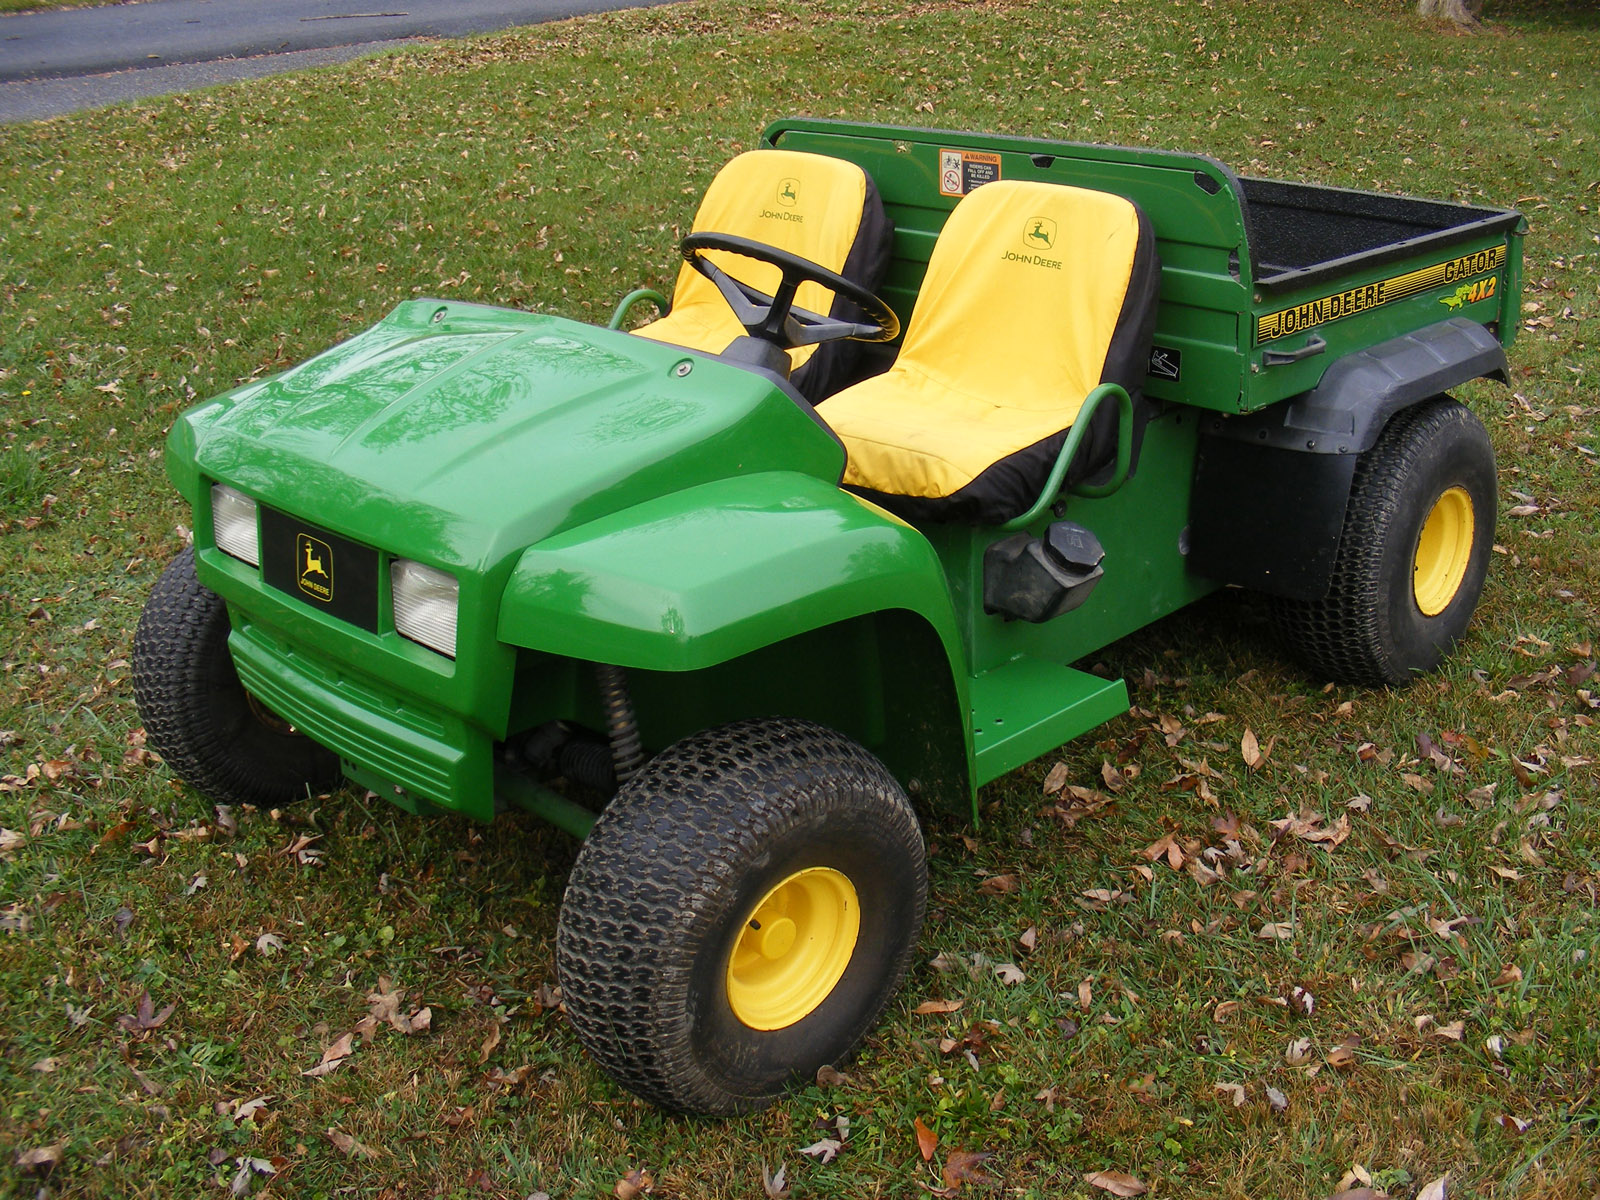 John Deere Gator Prices >> John Deere Gator 2015 Diesel | Autos Post